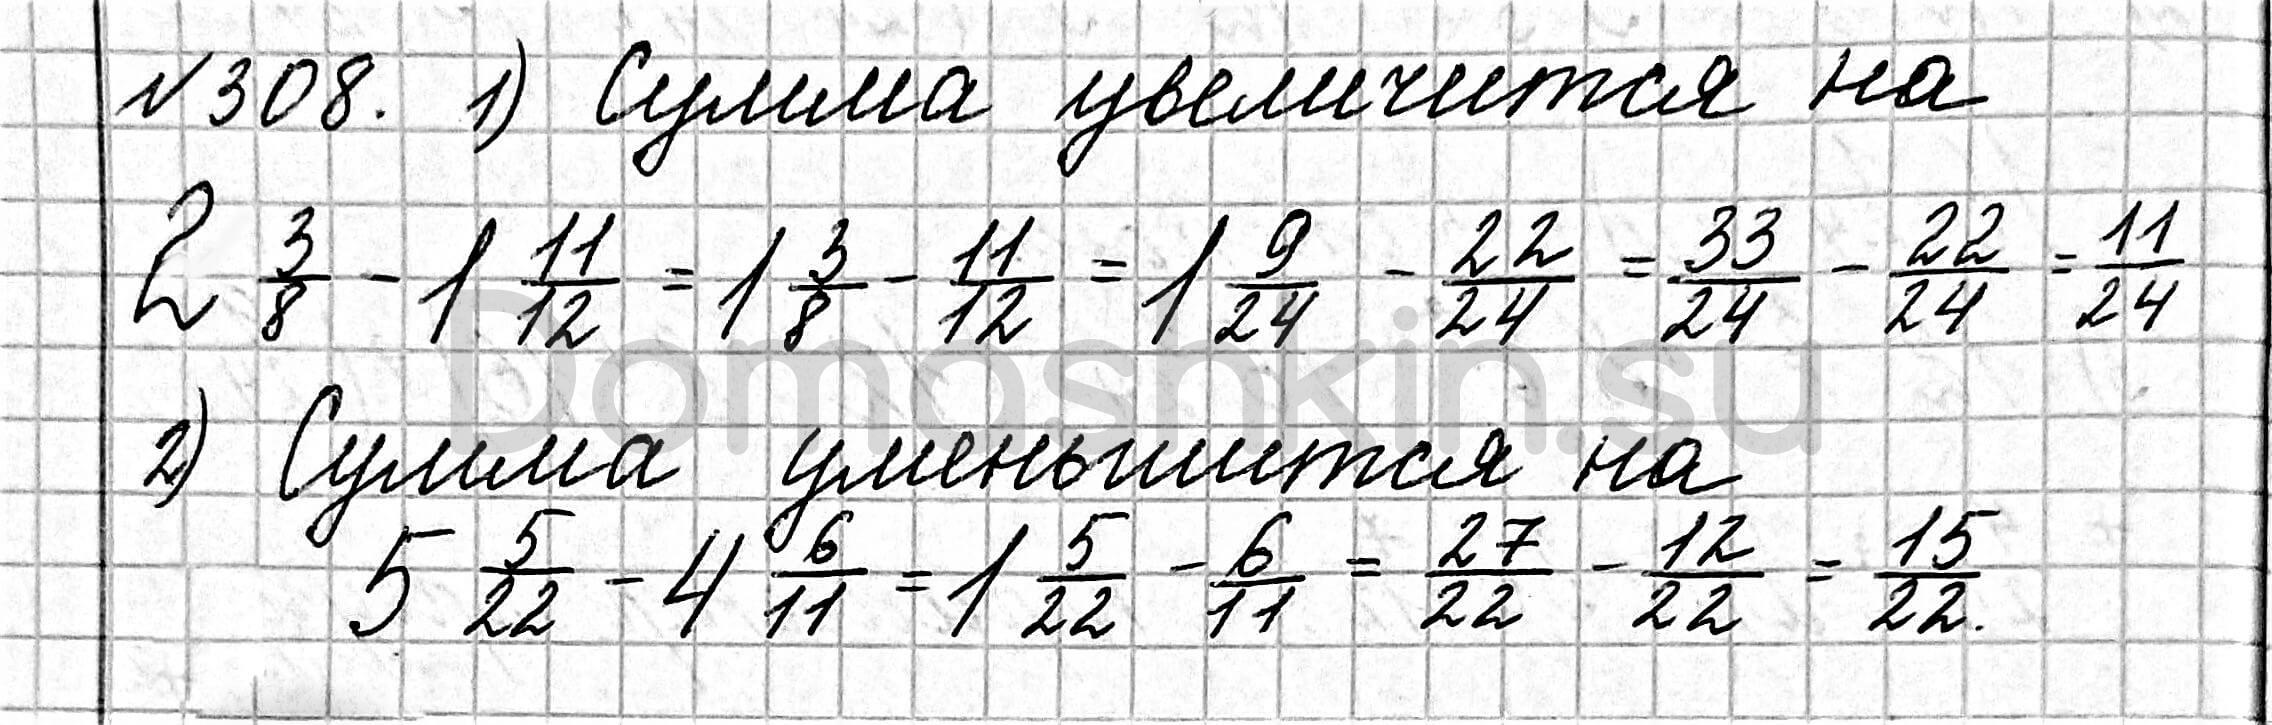 Математика 6 класс учебник Мерзляк номер 308 решение